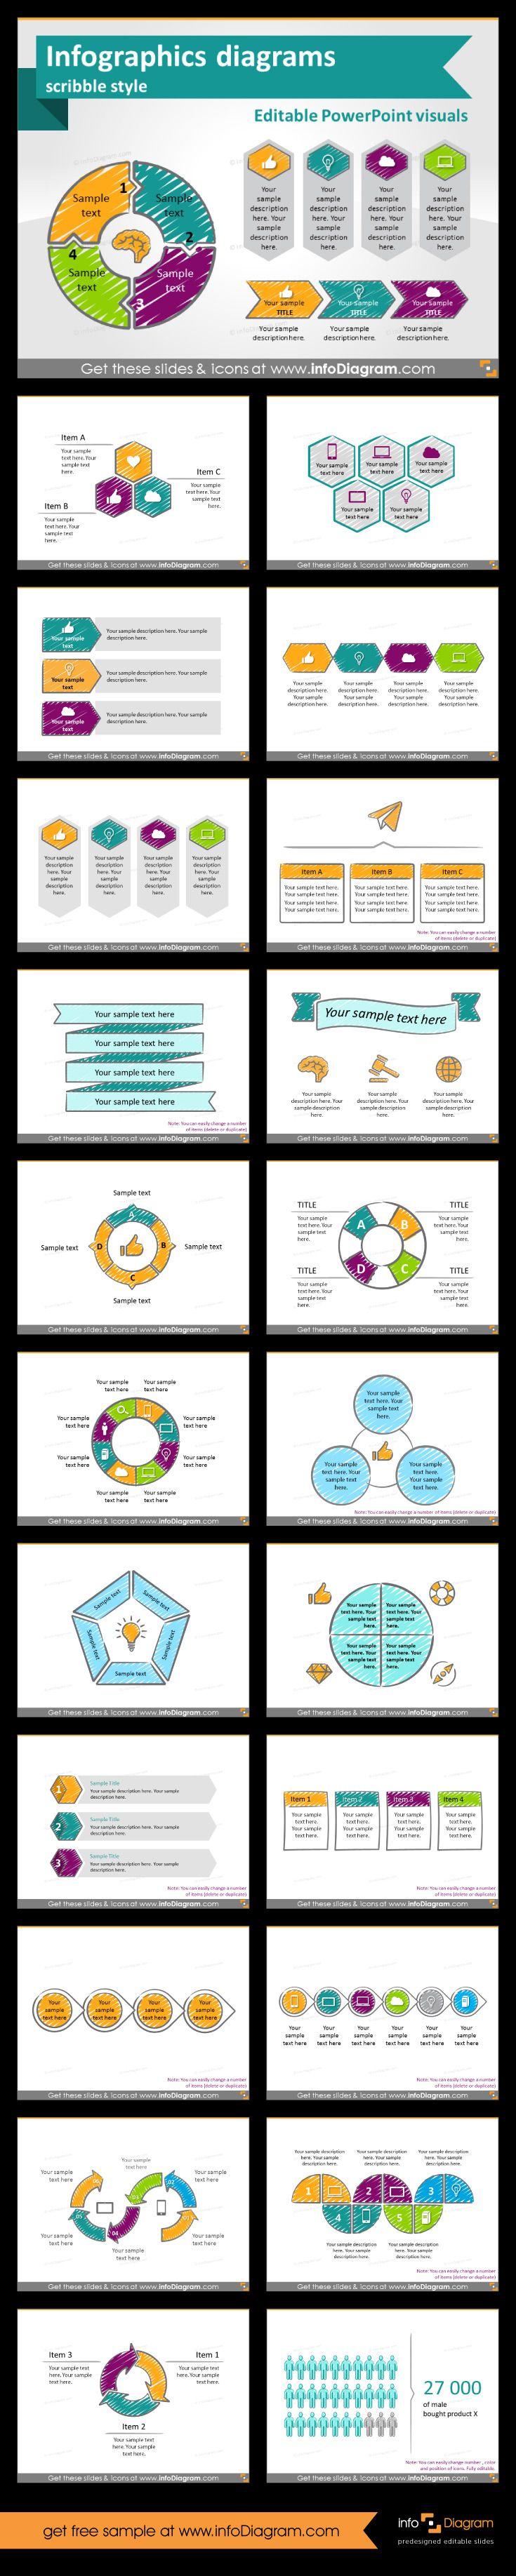 documentation of kpi templates